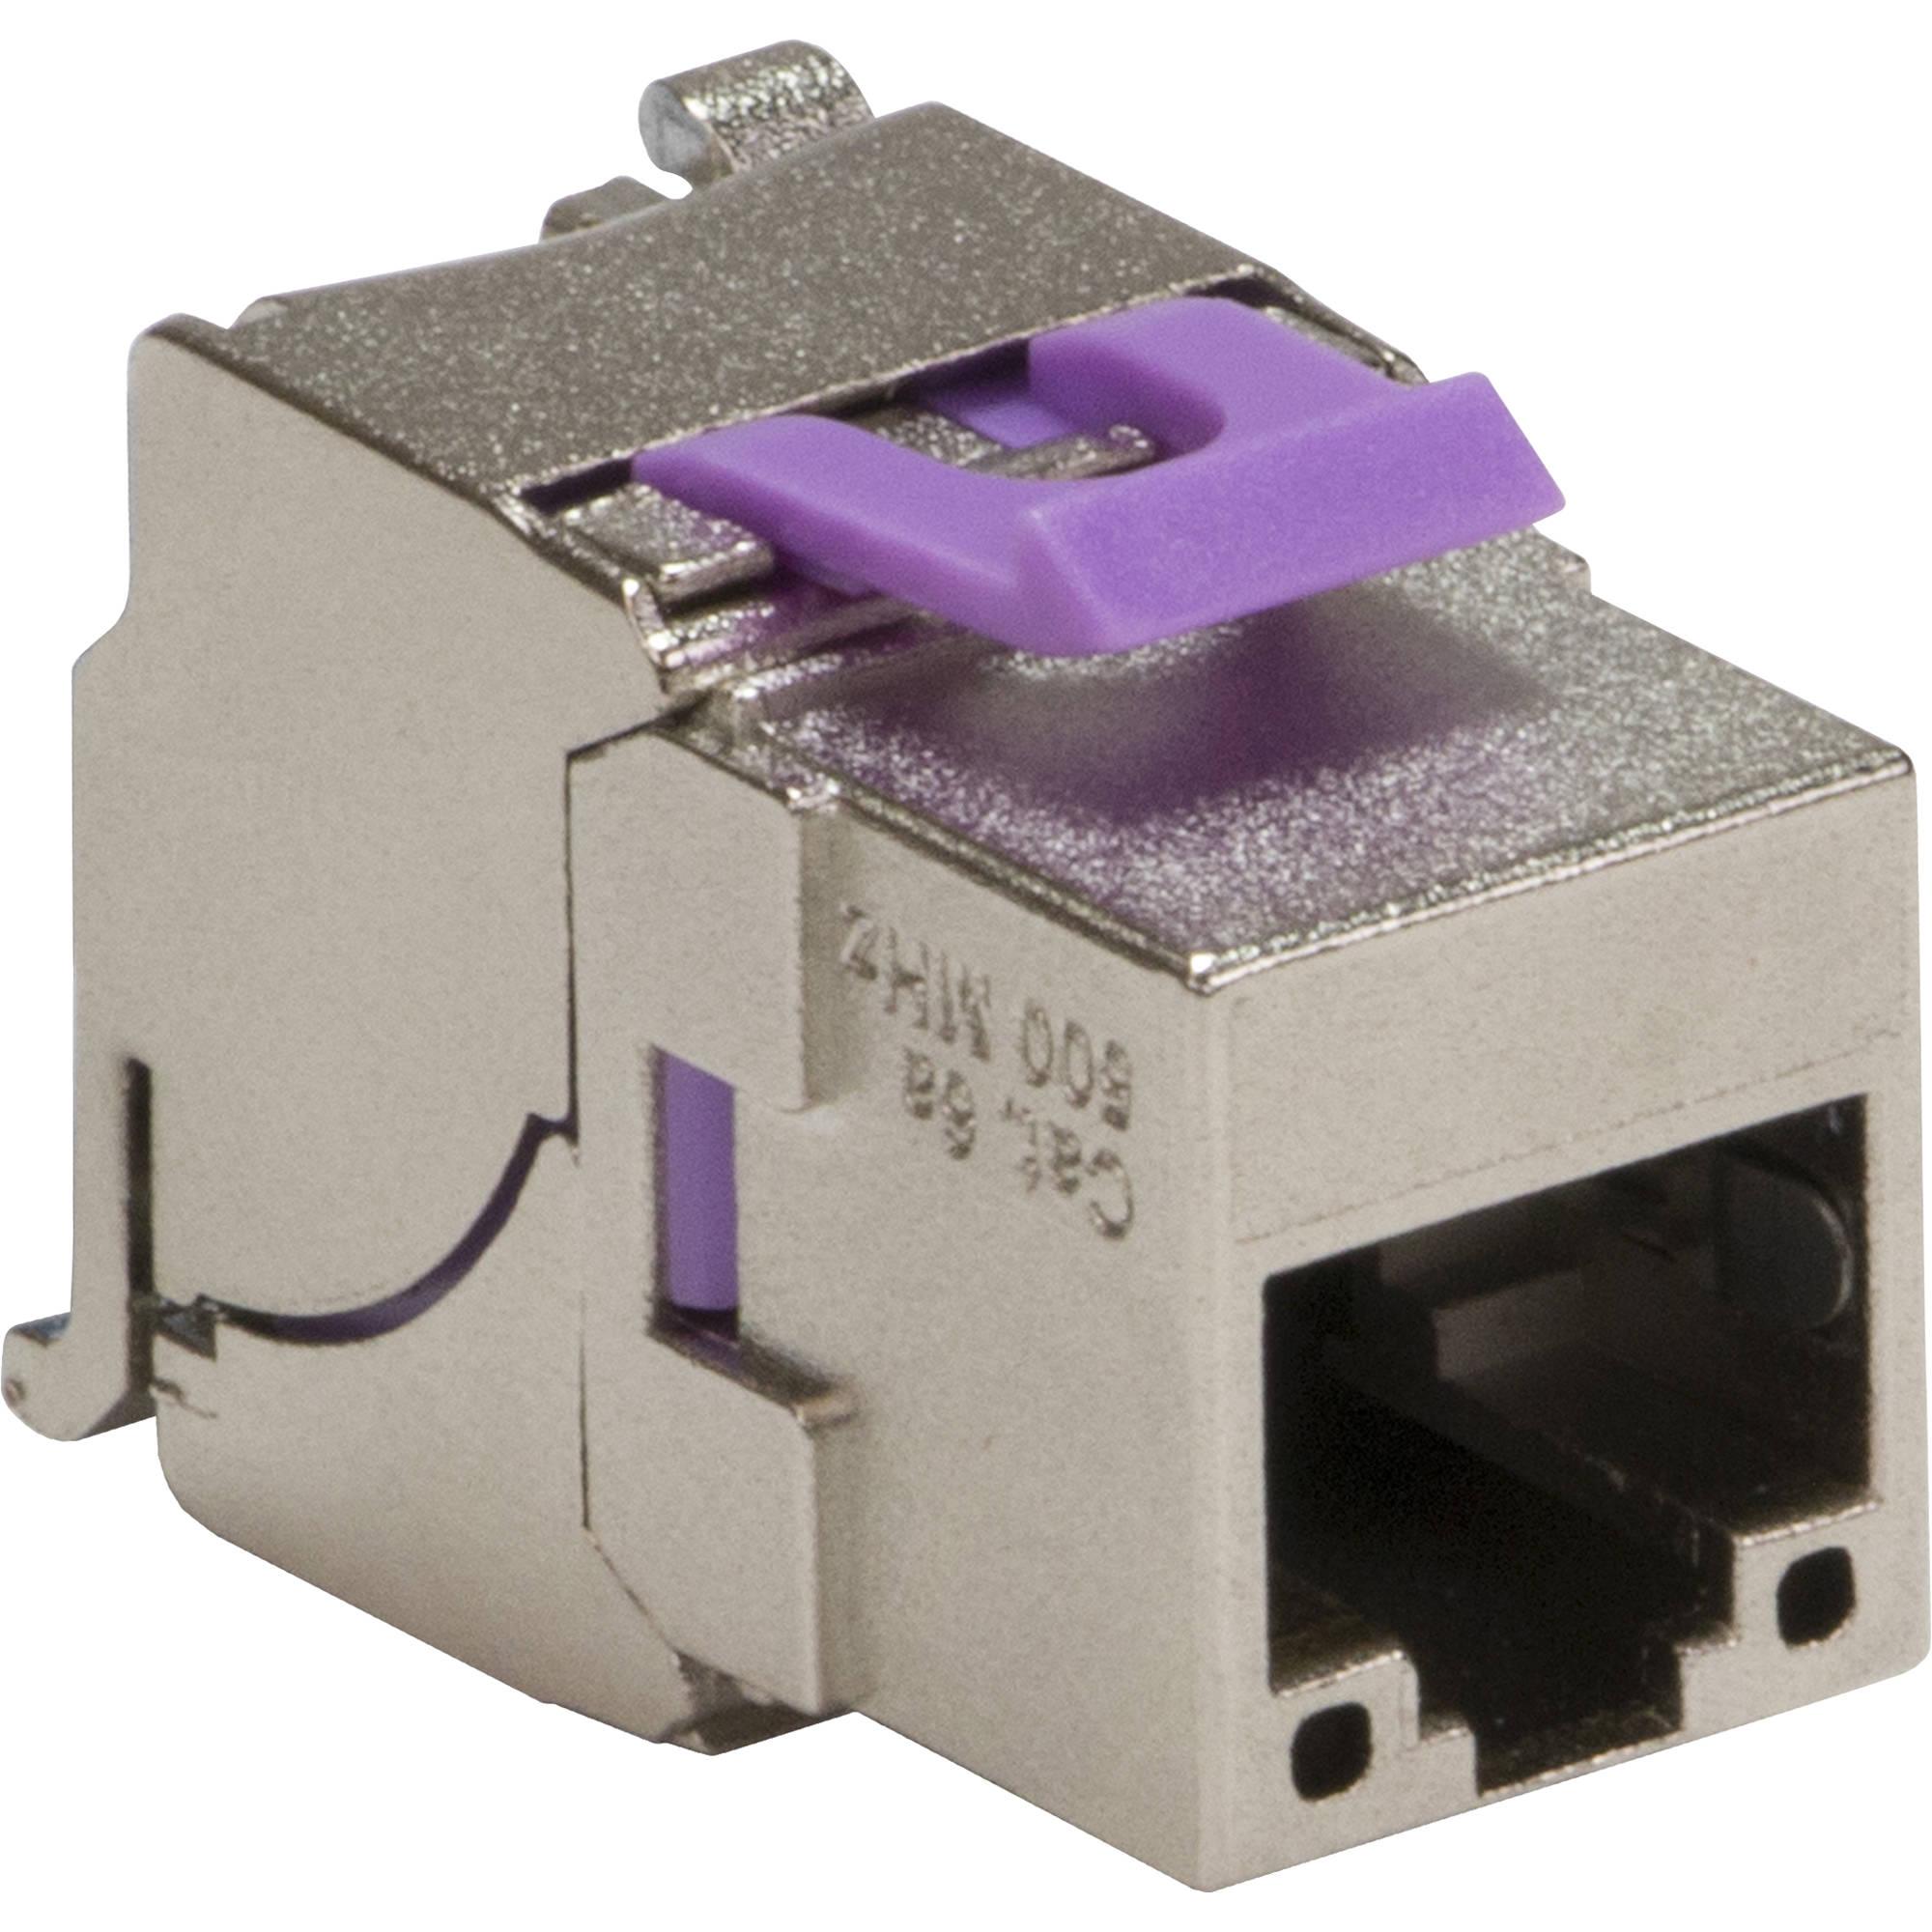 Platinum Tools Keystone Cat 6a Shielded Jack 751 1 Bh Photo Wiring